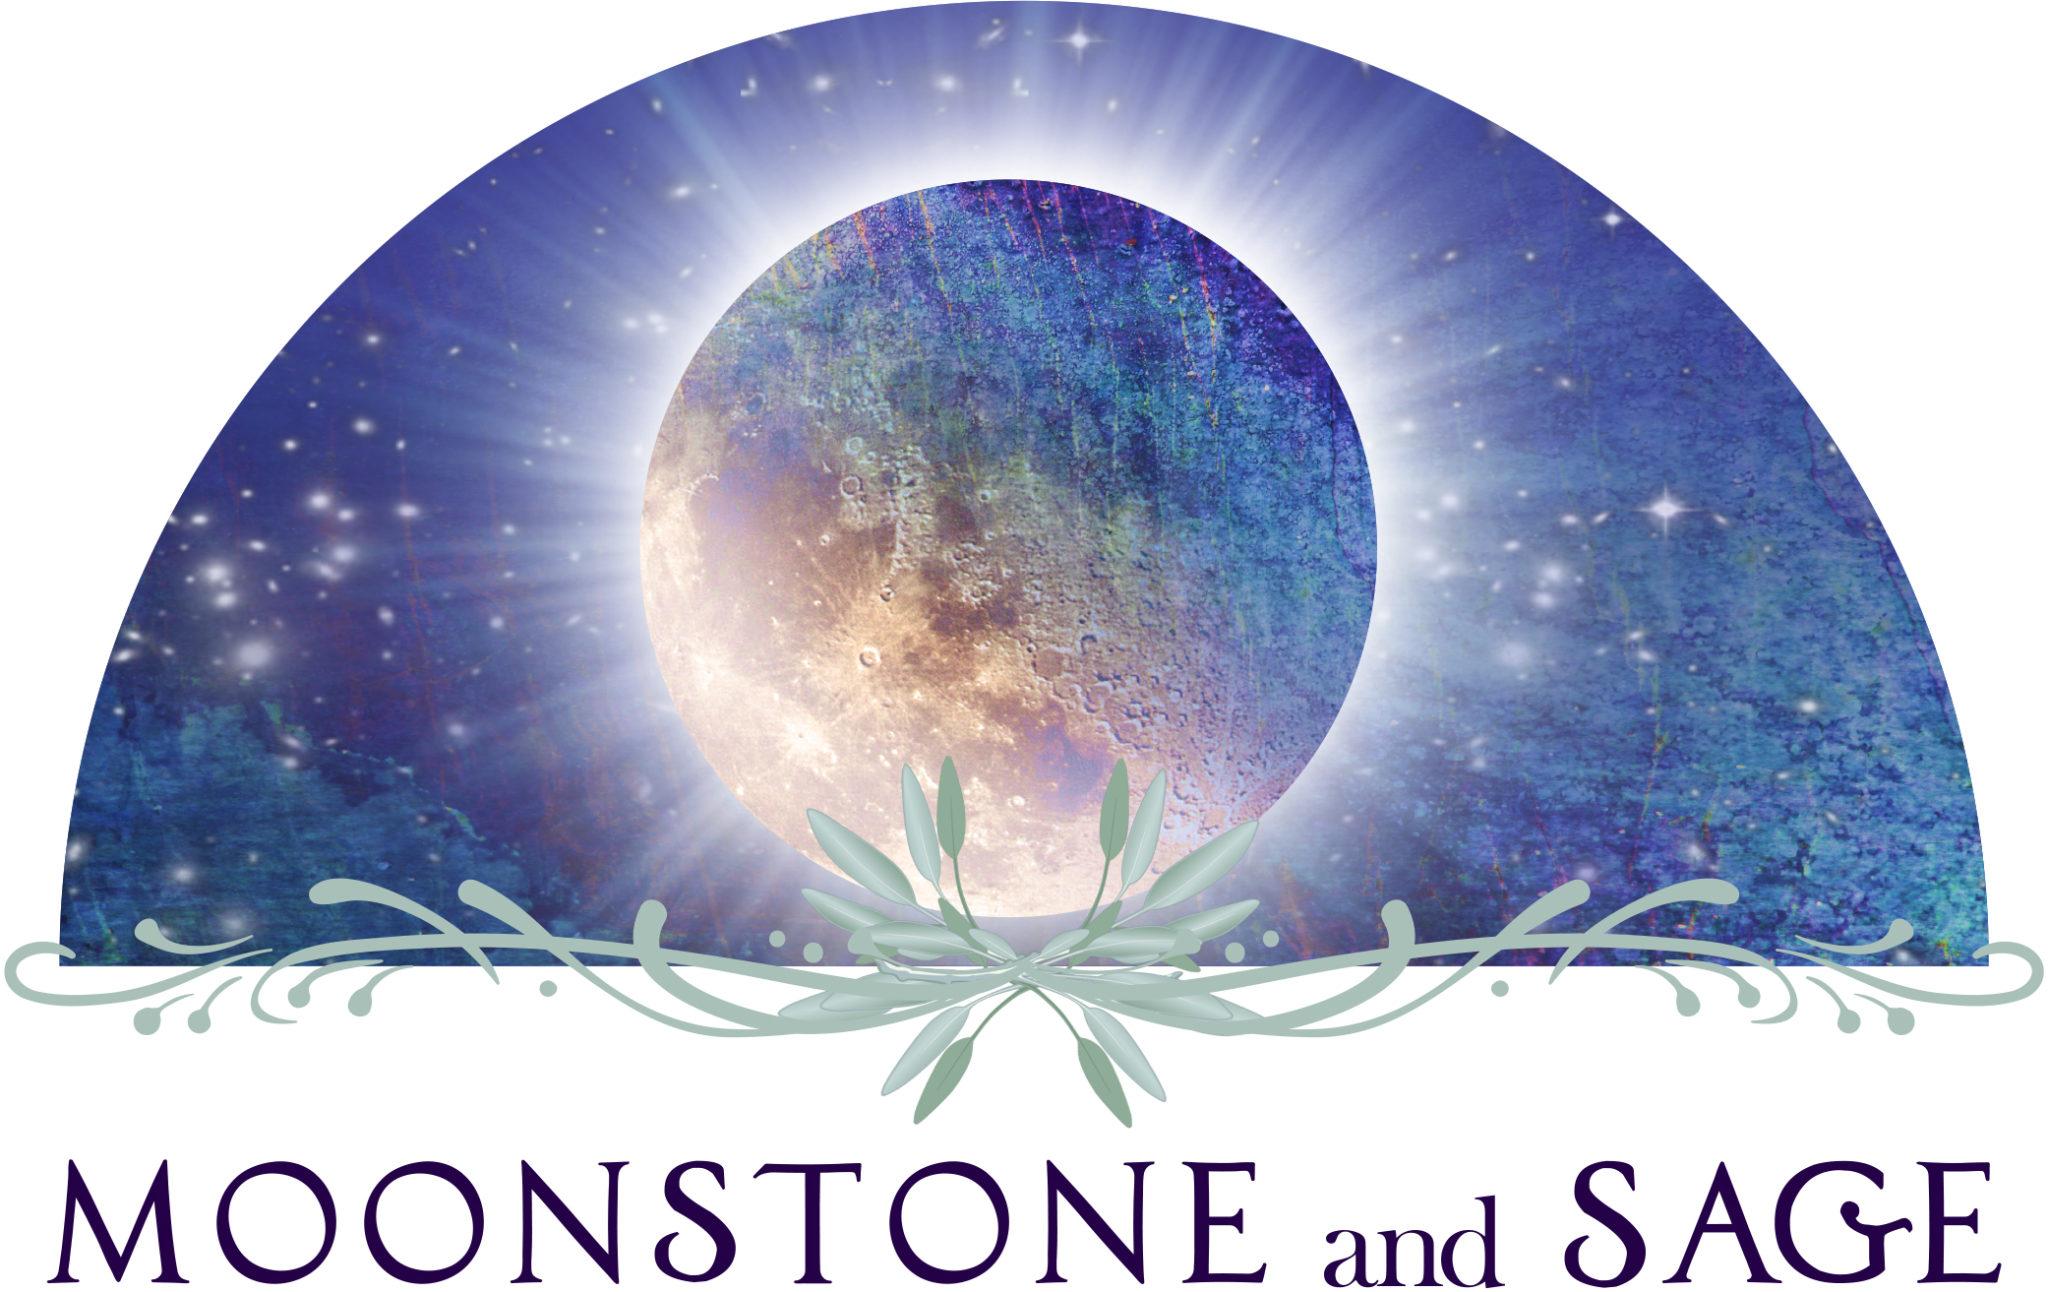 Moonstone and Sage